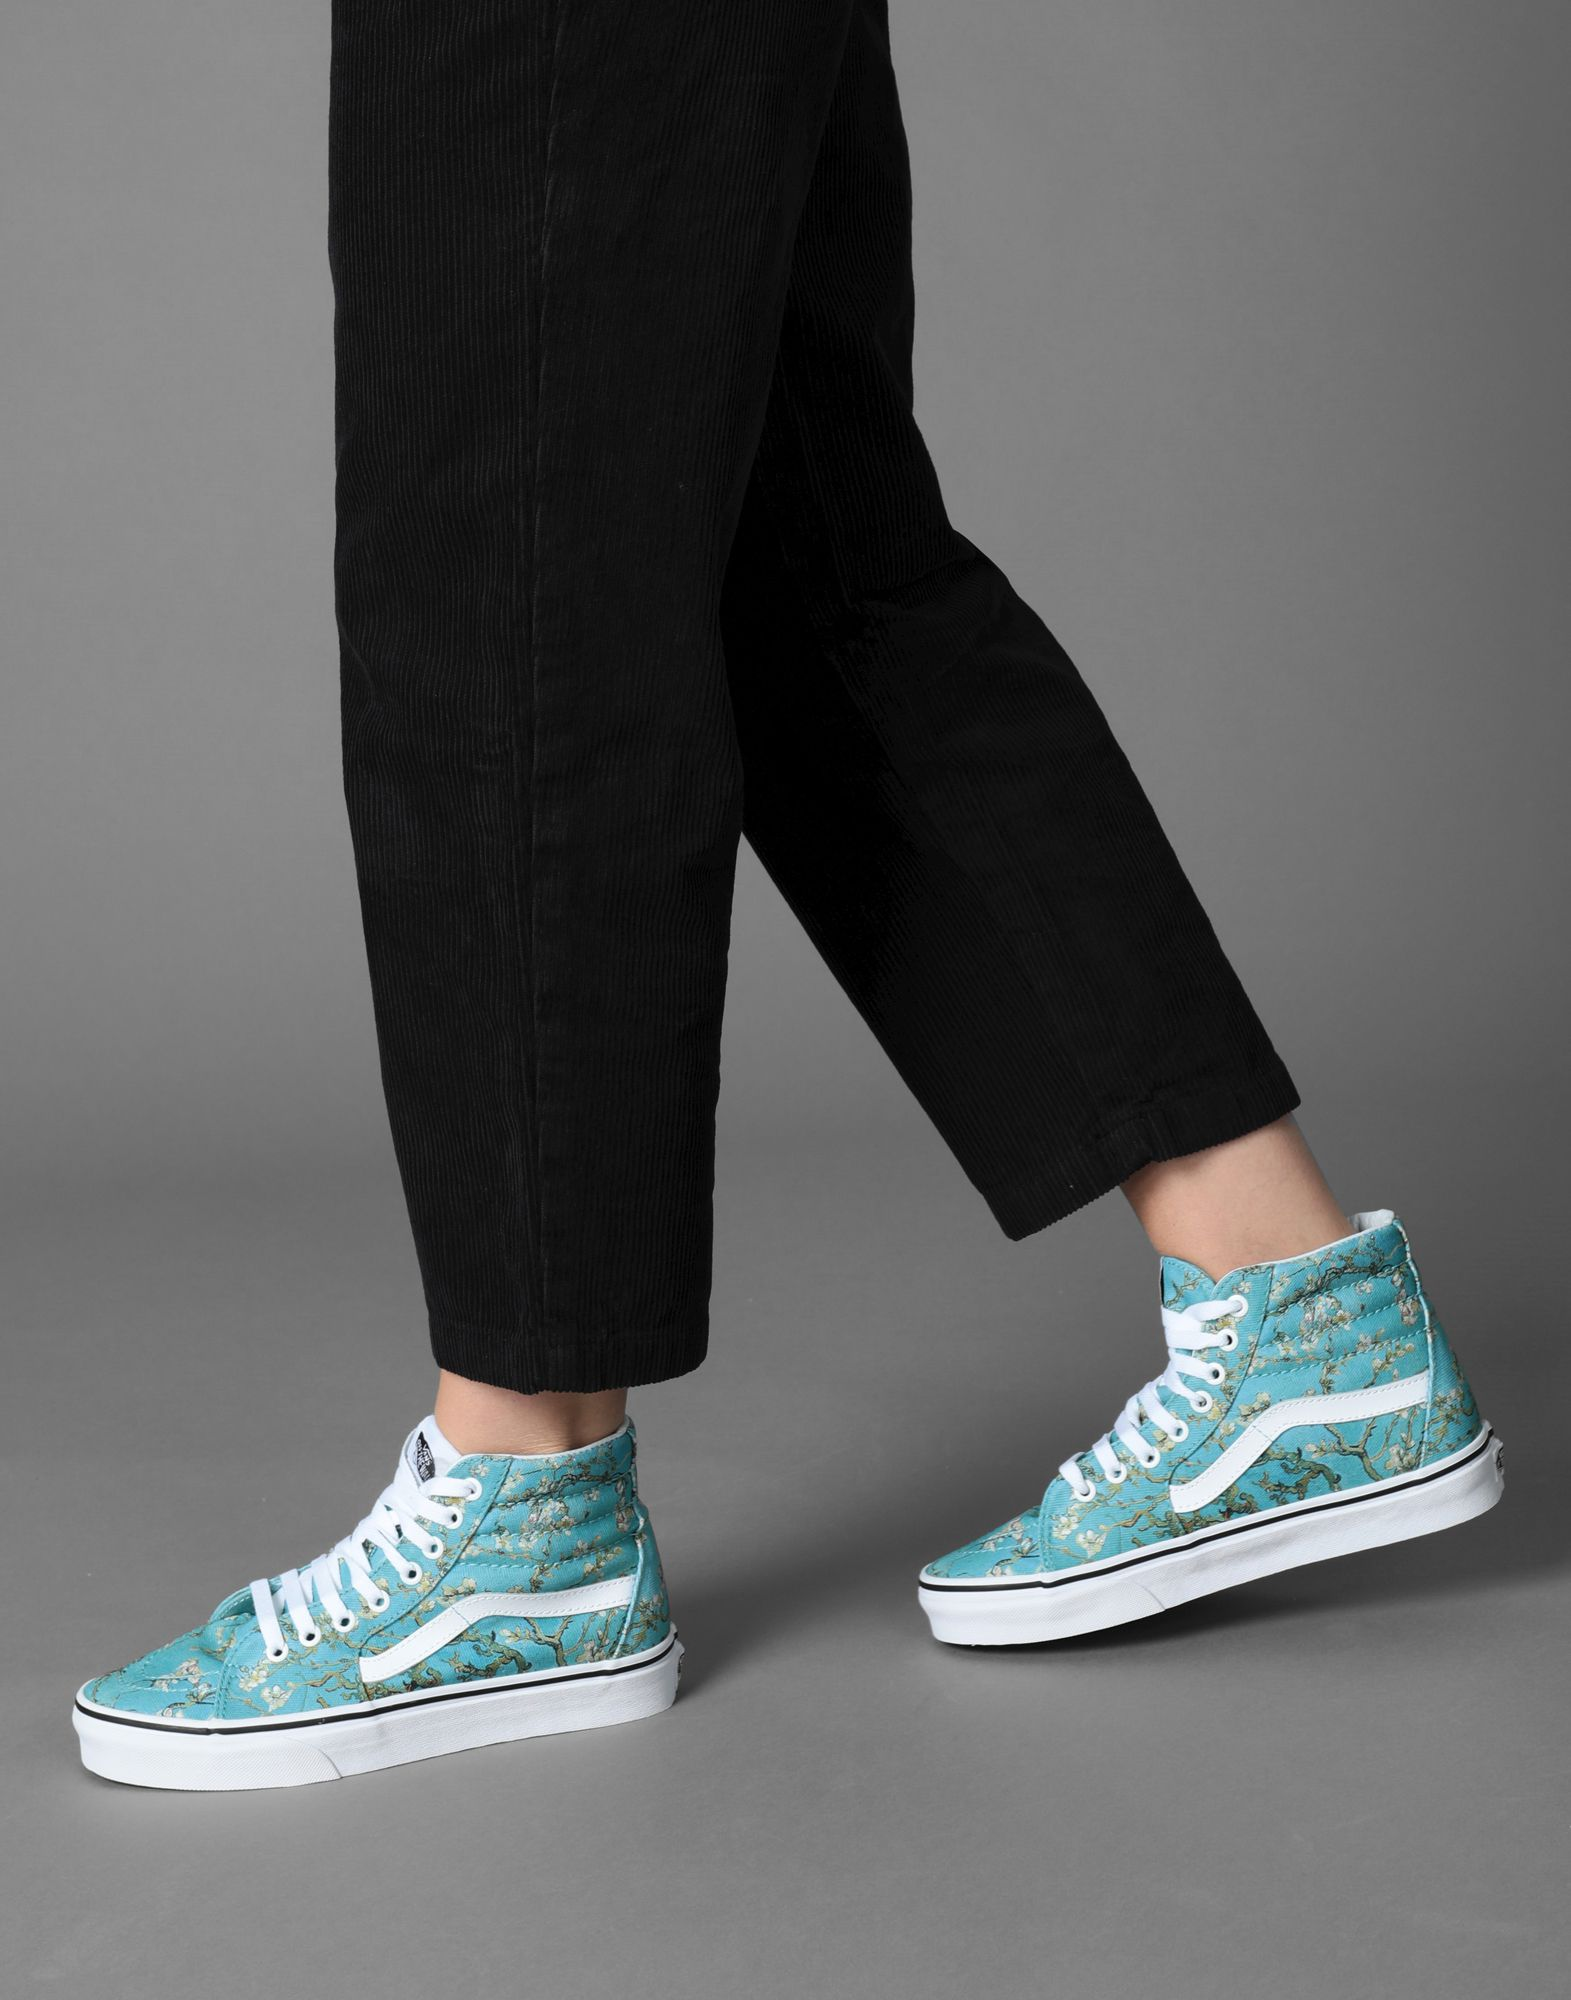 Vans Ua Sk8-Hi (Vincent Van Gogh) Gogh) Gogh) - Sneakers - Women Vans Sneakers online on  United Kingdom - 11560070UM 8a3309